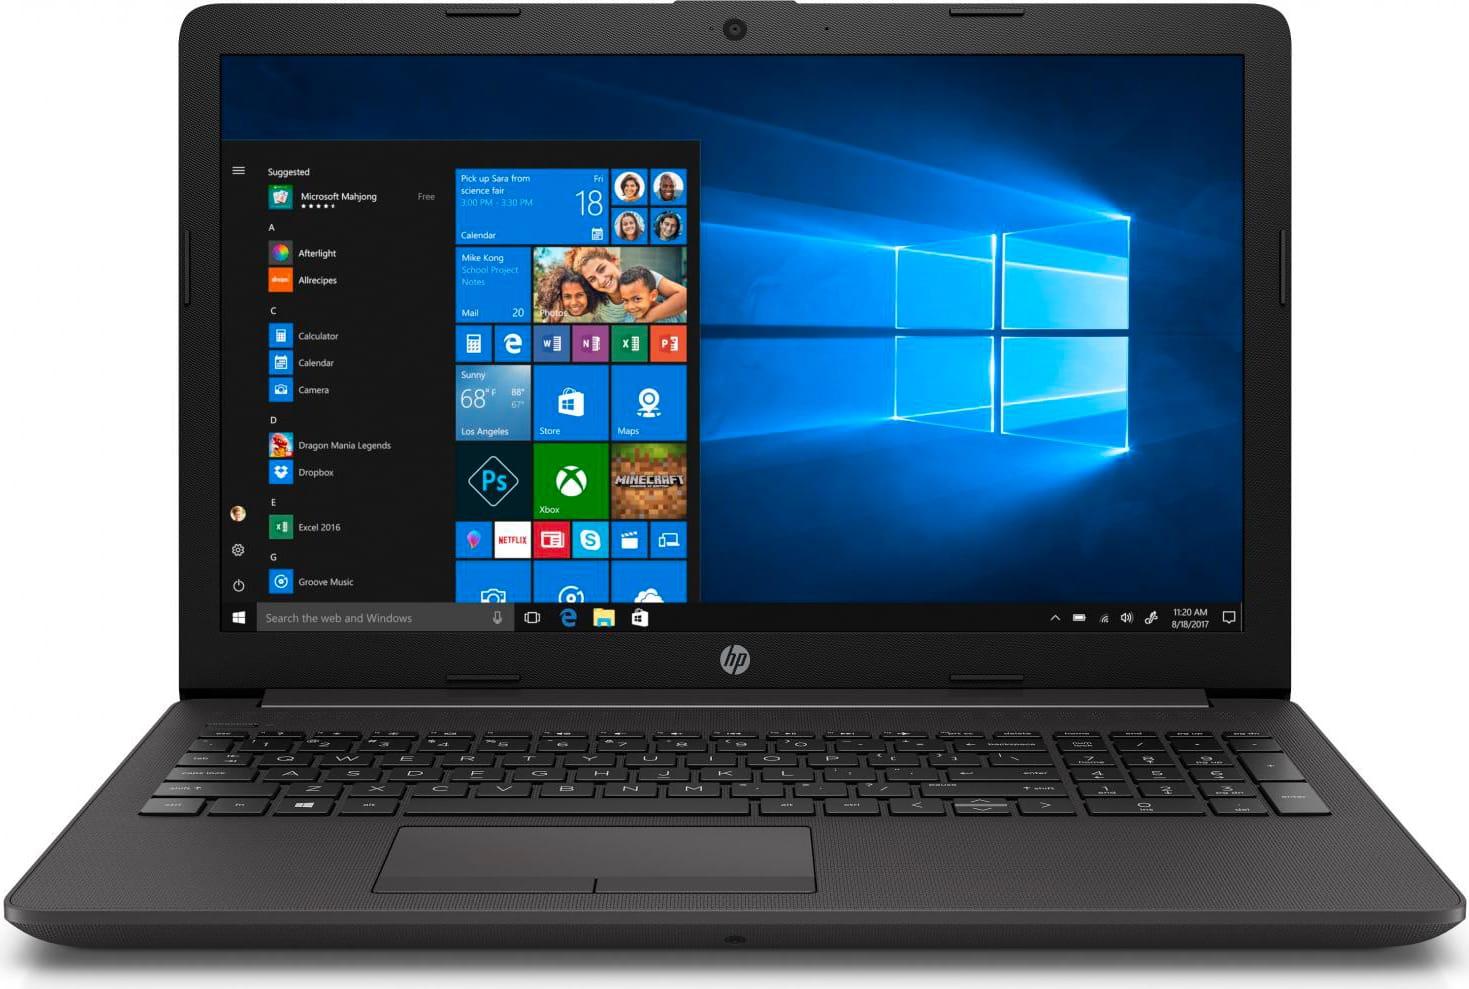 "HP 6bp89ea Notebook N4000 Intel Celeron Hdd 500 Gb Ram 4 Gb 15.6"" Intel Uhd Graphics 600 Windows 10 Home - 6bp89ea 250 G7"